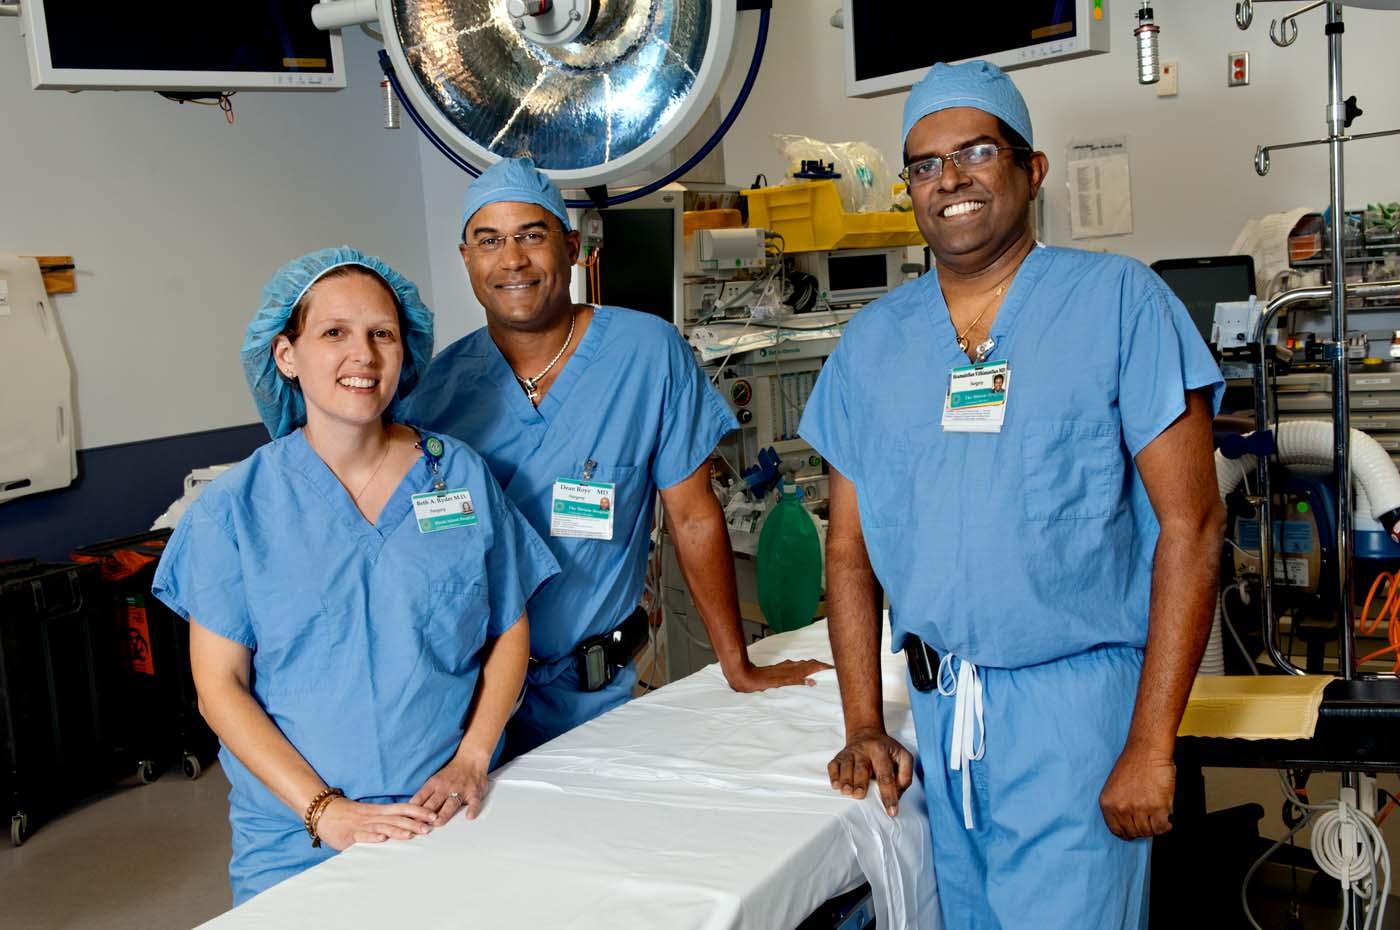 Weight Loss Surgery Rhode Island - Brown Surgical Associates - weight loss - Bariatric Surgery near me